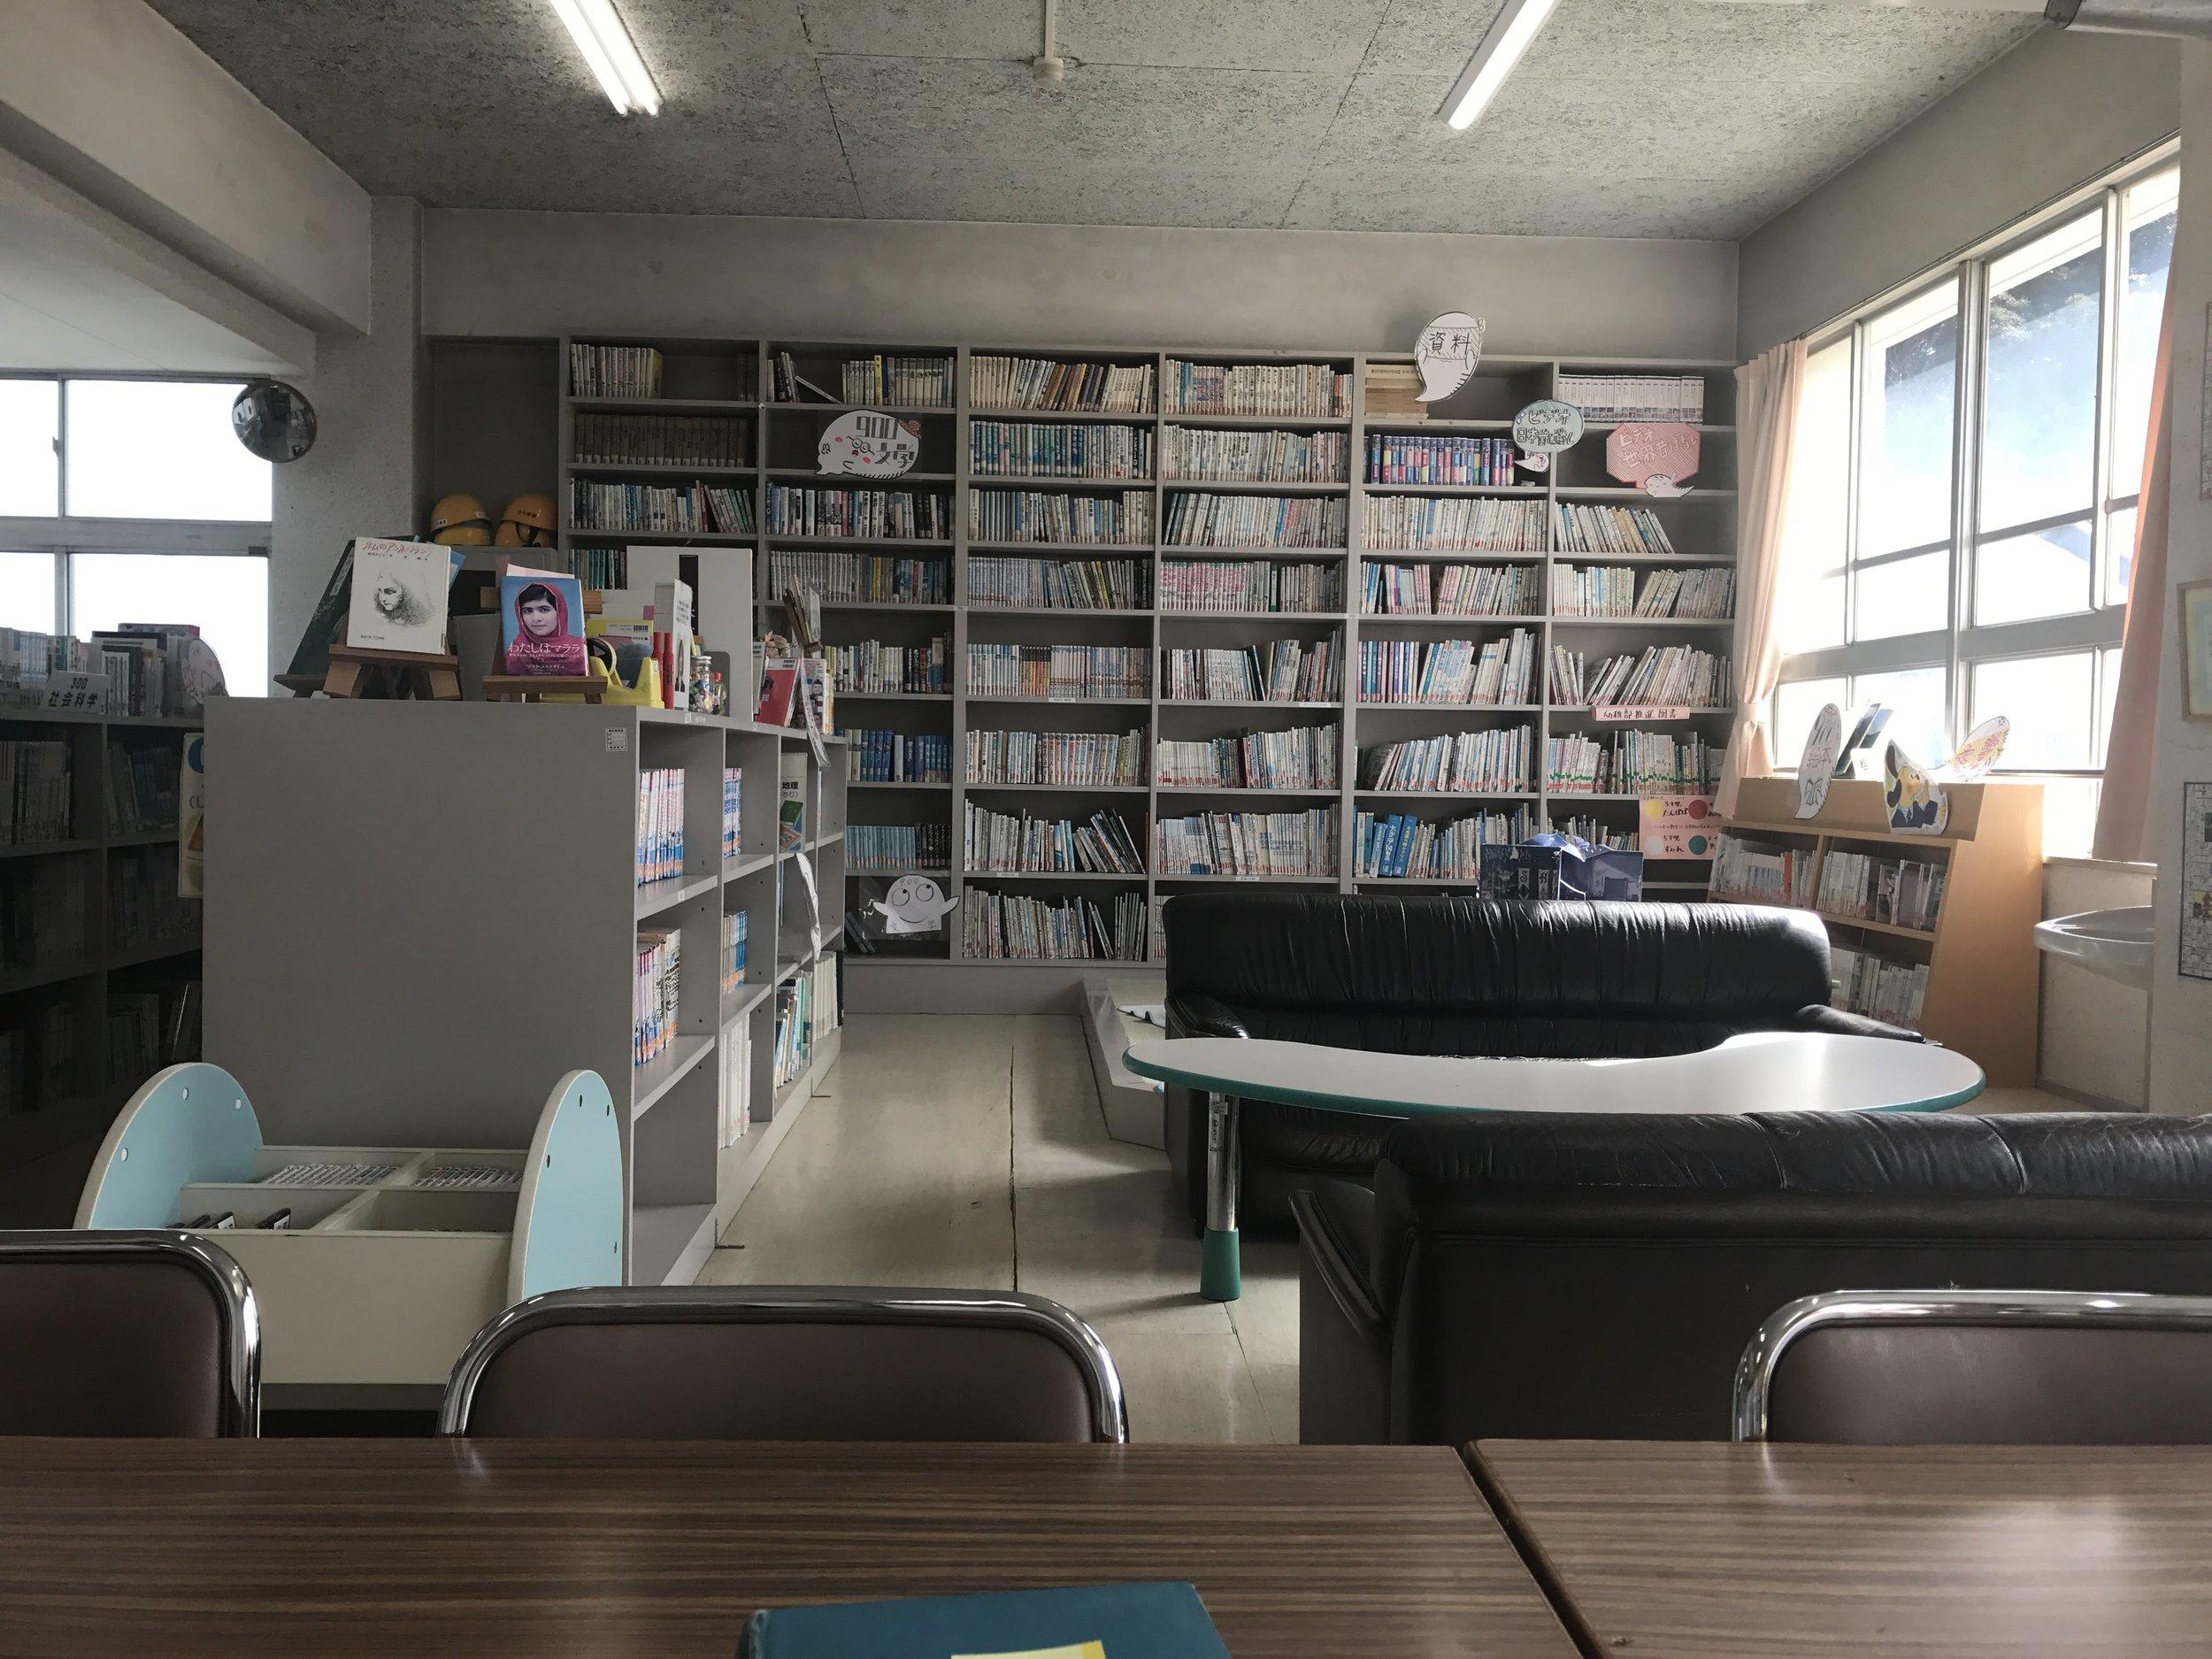 Japanese School Tour: Elementary School Library